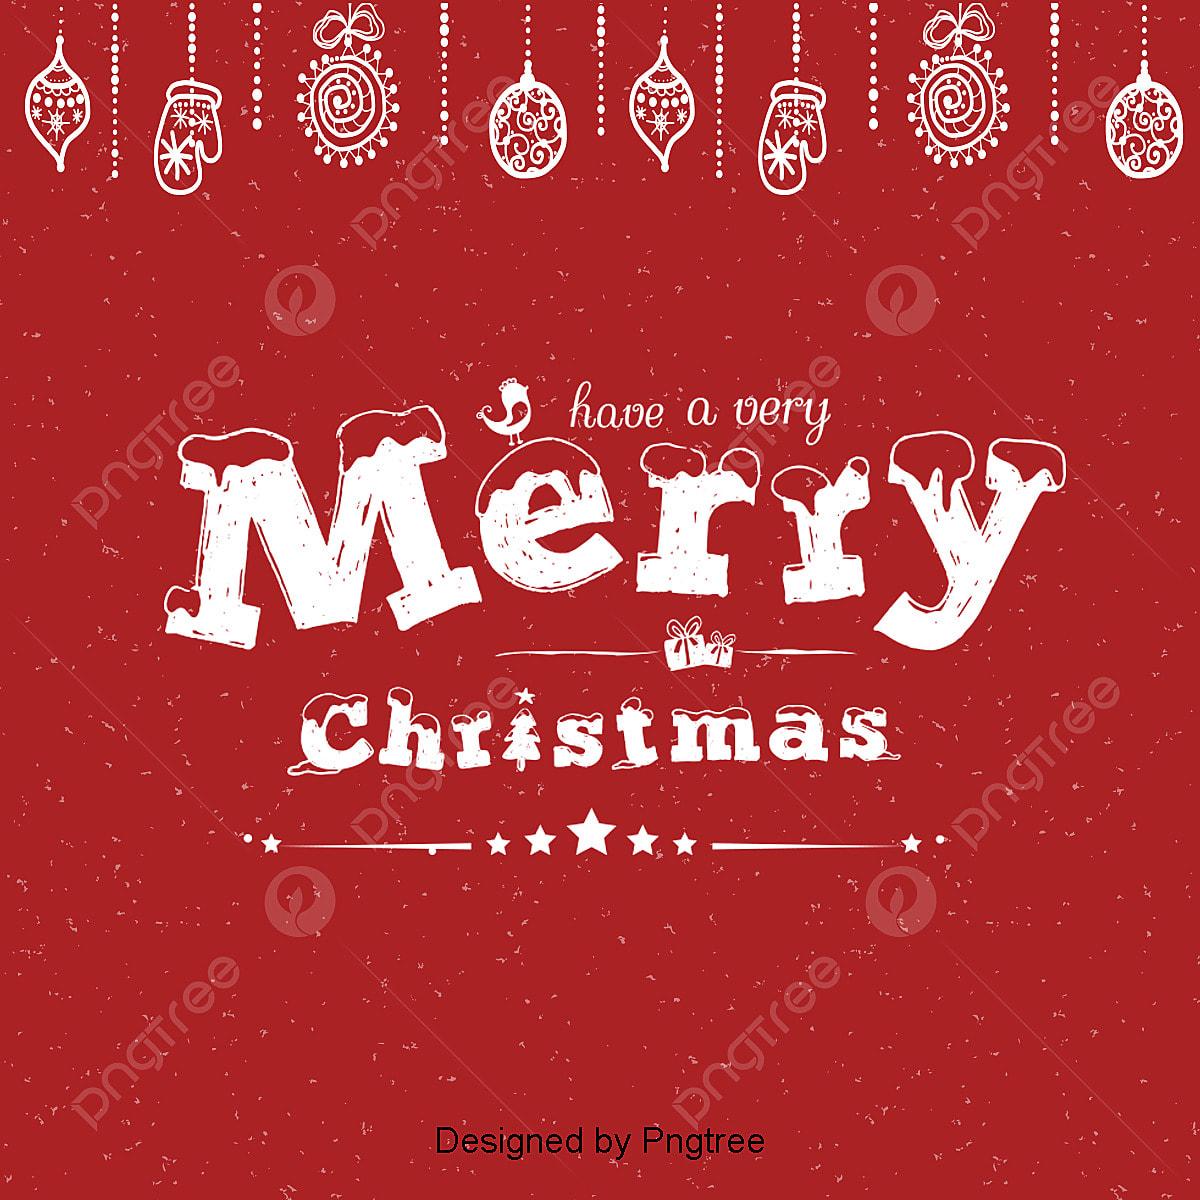 Christmas Graffiti Background.Red Creative Graffiti Christmas Background Blessings